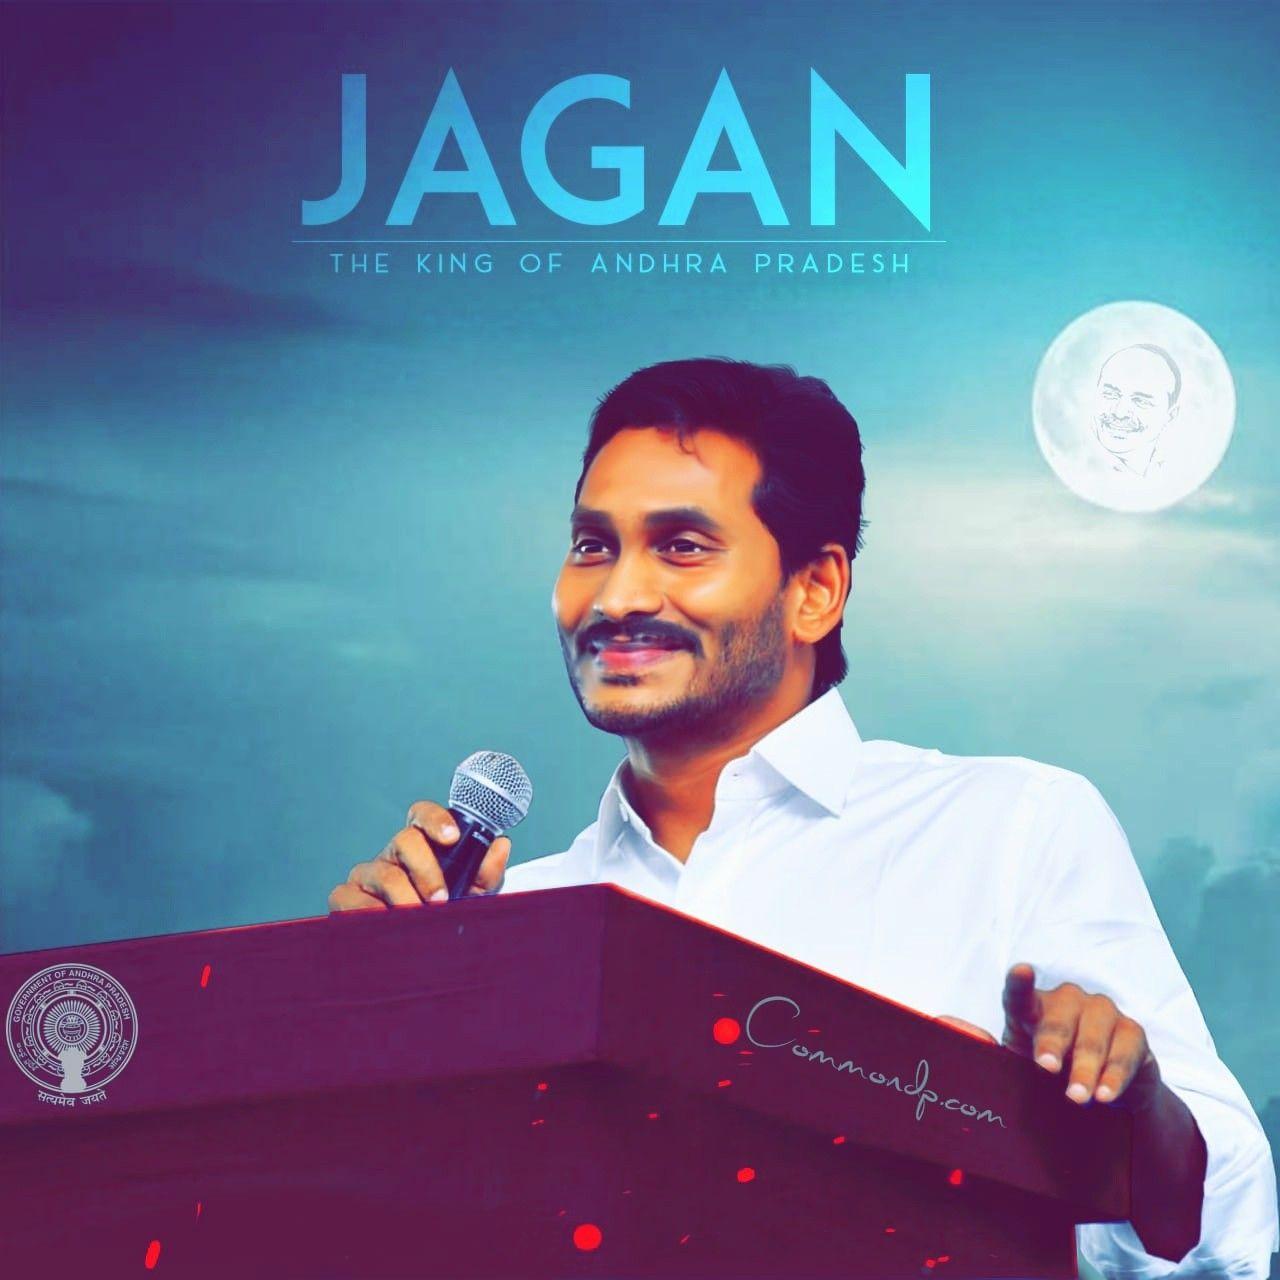 Ap Cm Ys Jagan Mohan Reddy Wallpaper Free Download New Images Hd Download Wallpaper Hd